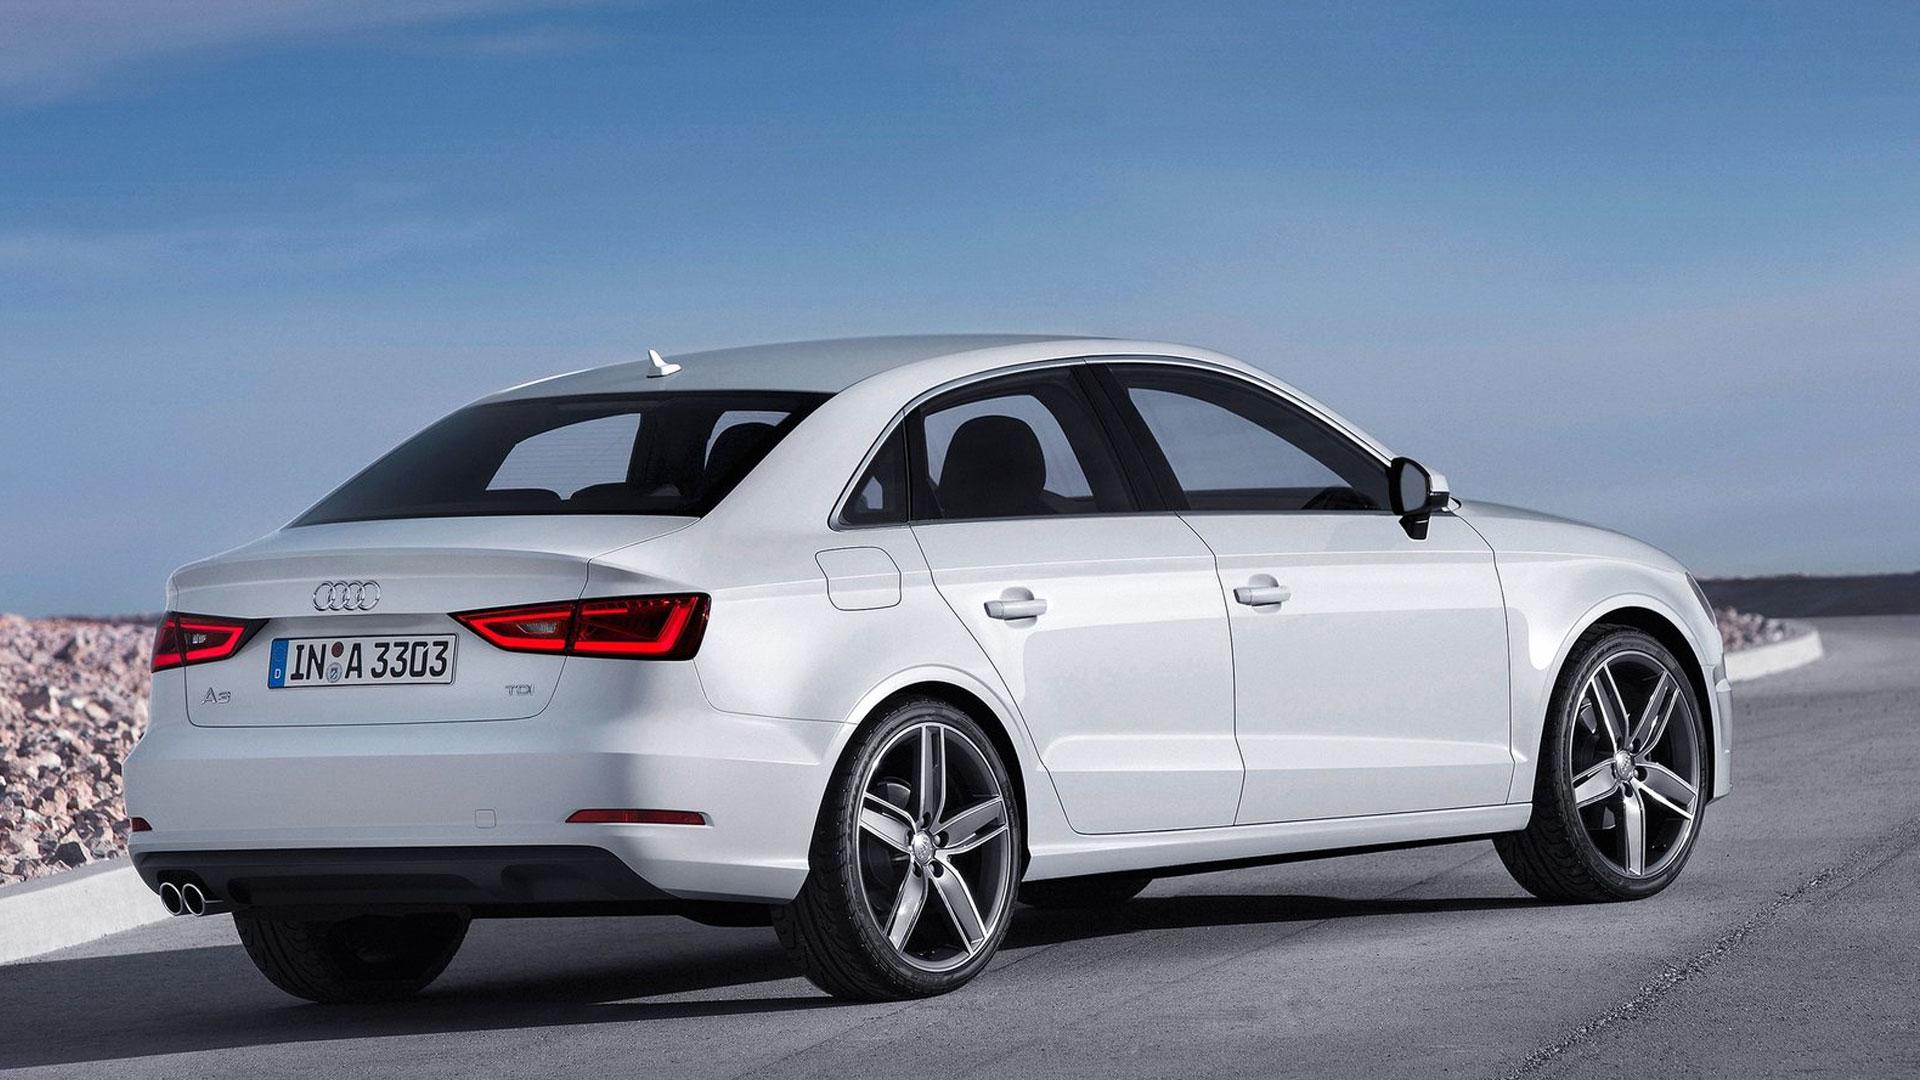 2014 Audi A3 Sedan Review 2014 HD Wallpaper